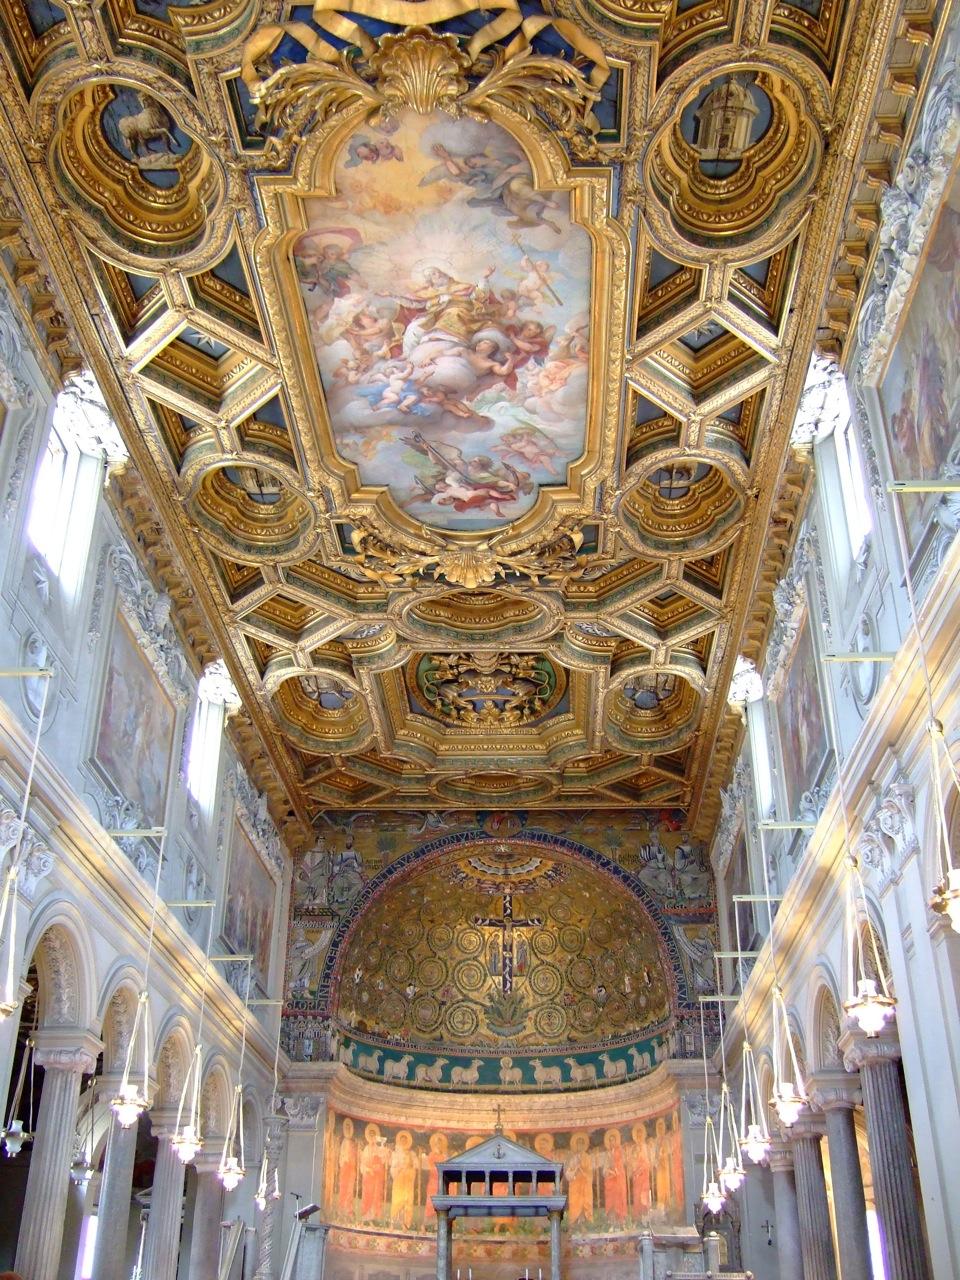 basilica-san-clemente-ceiling